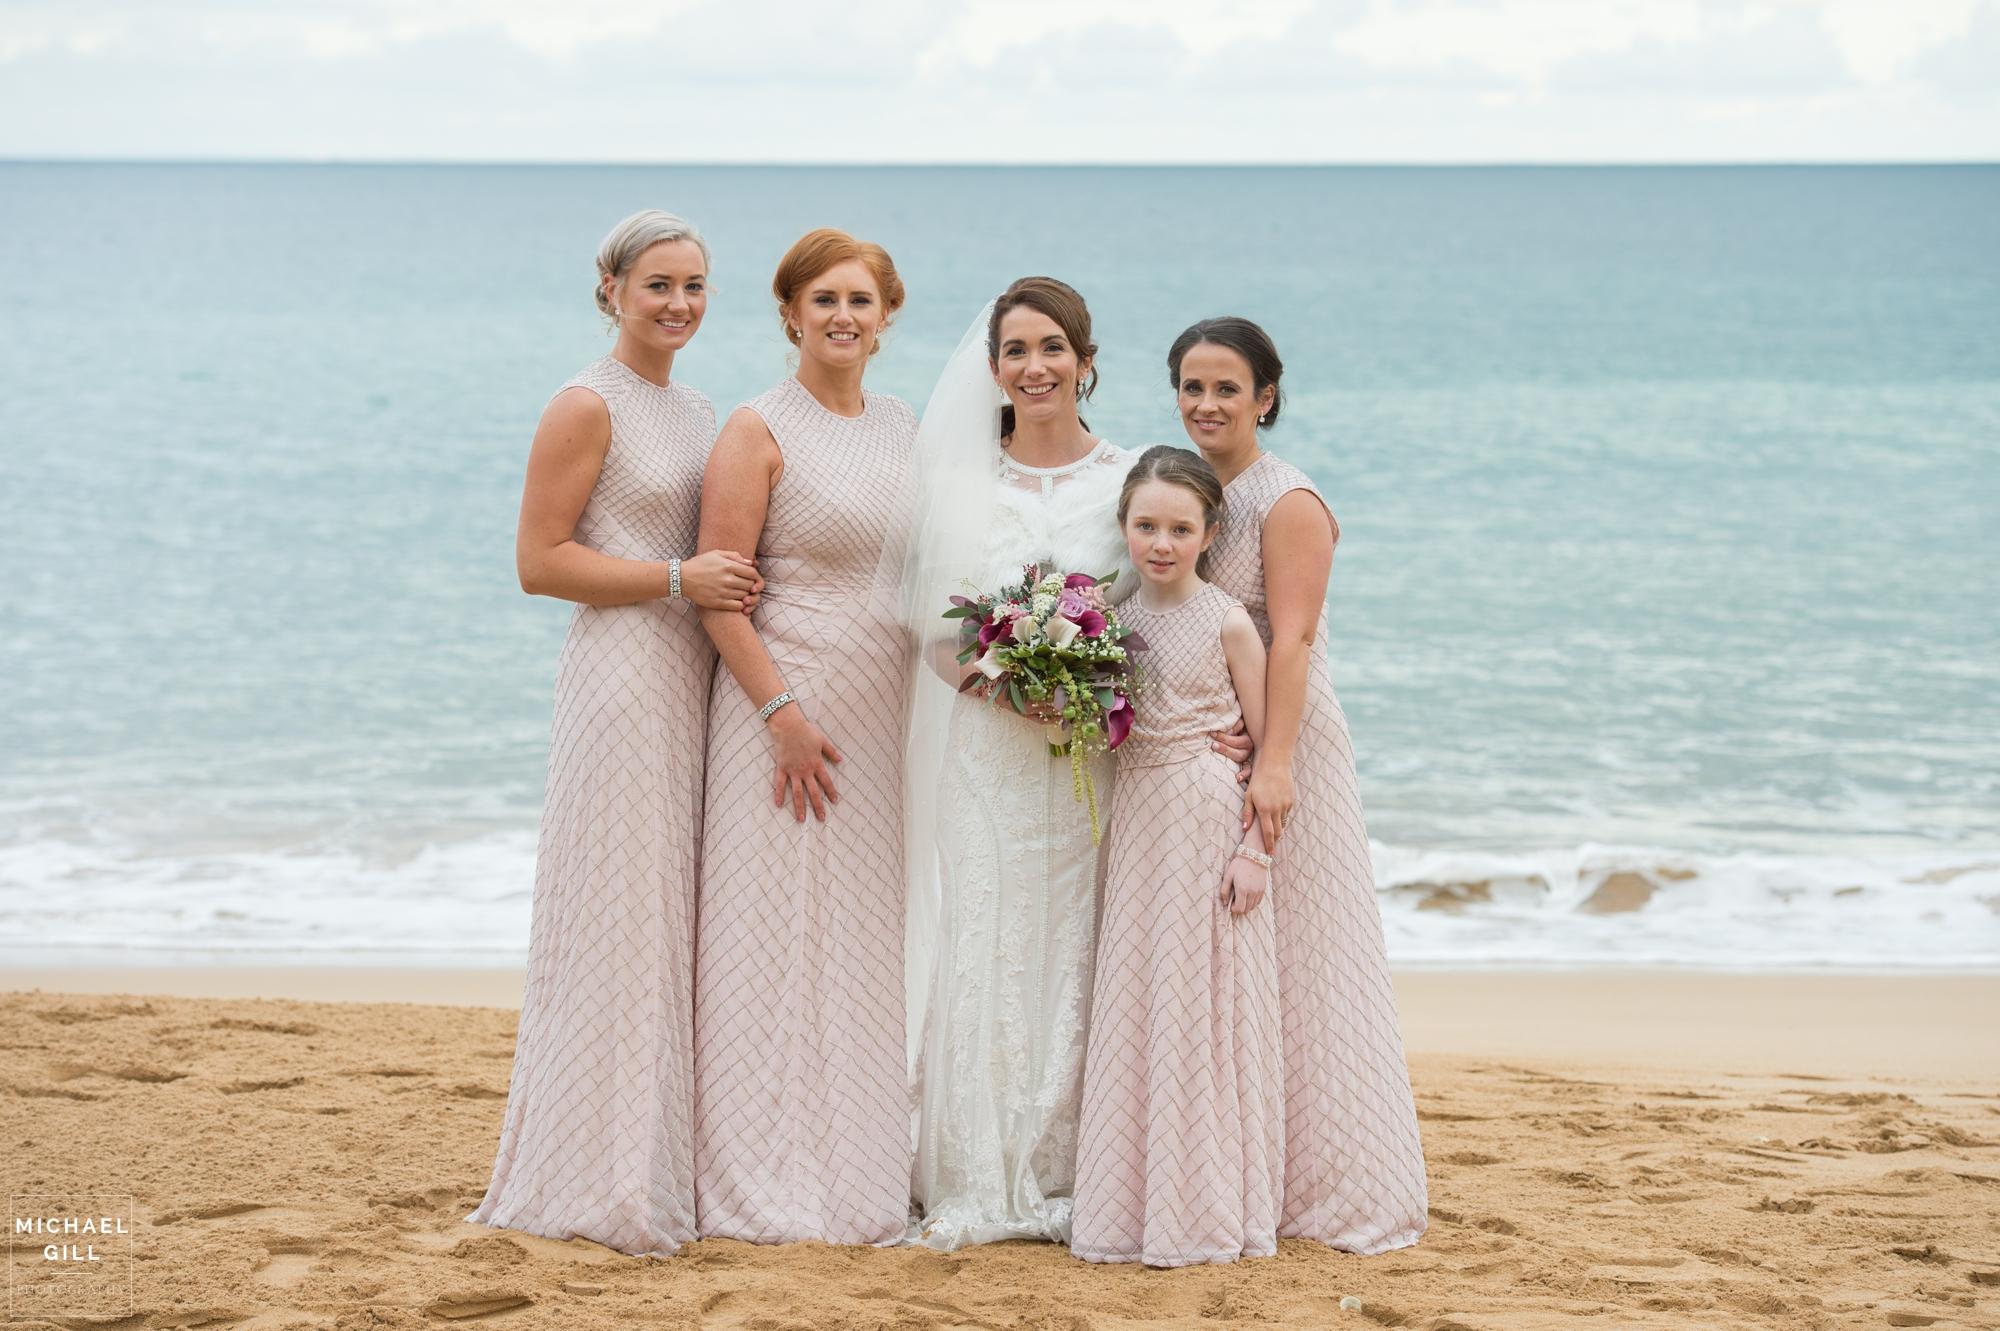 Michael_Gill_Photography_Kinnego_Redcastle_Hotel_Wedding5 (1).jpg